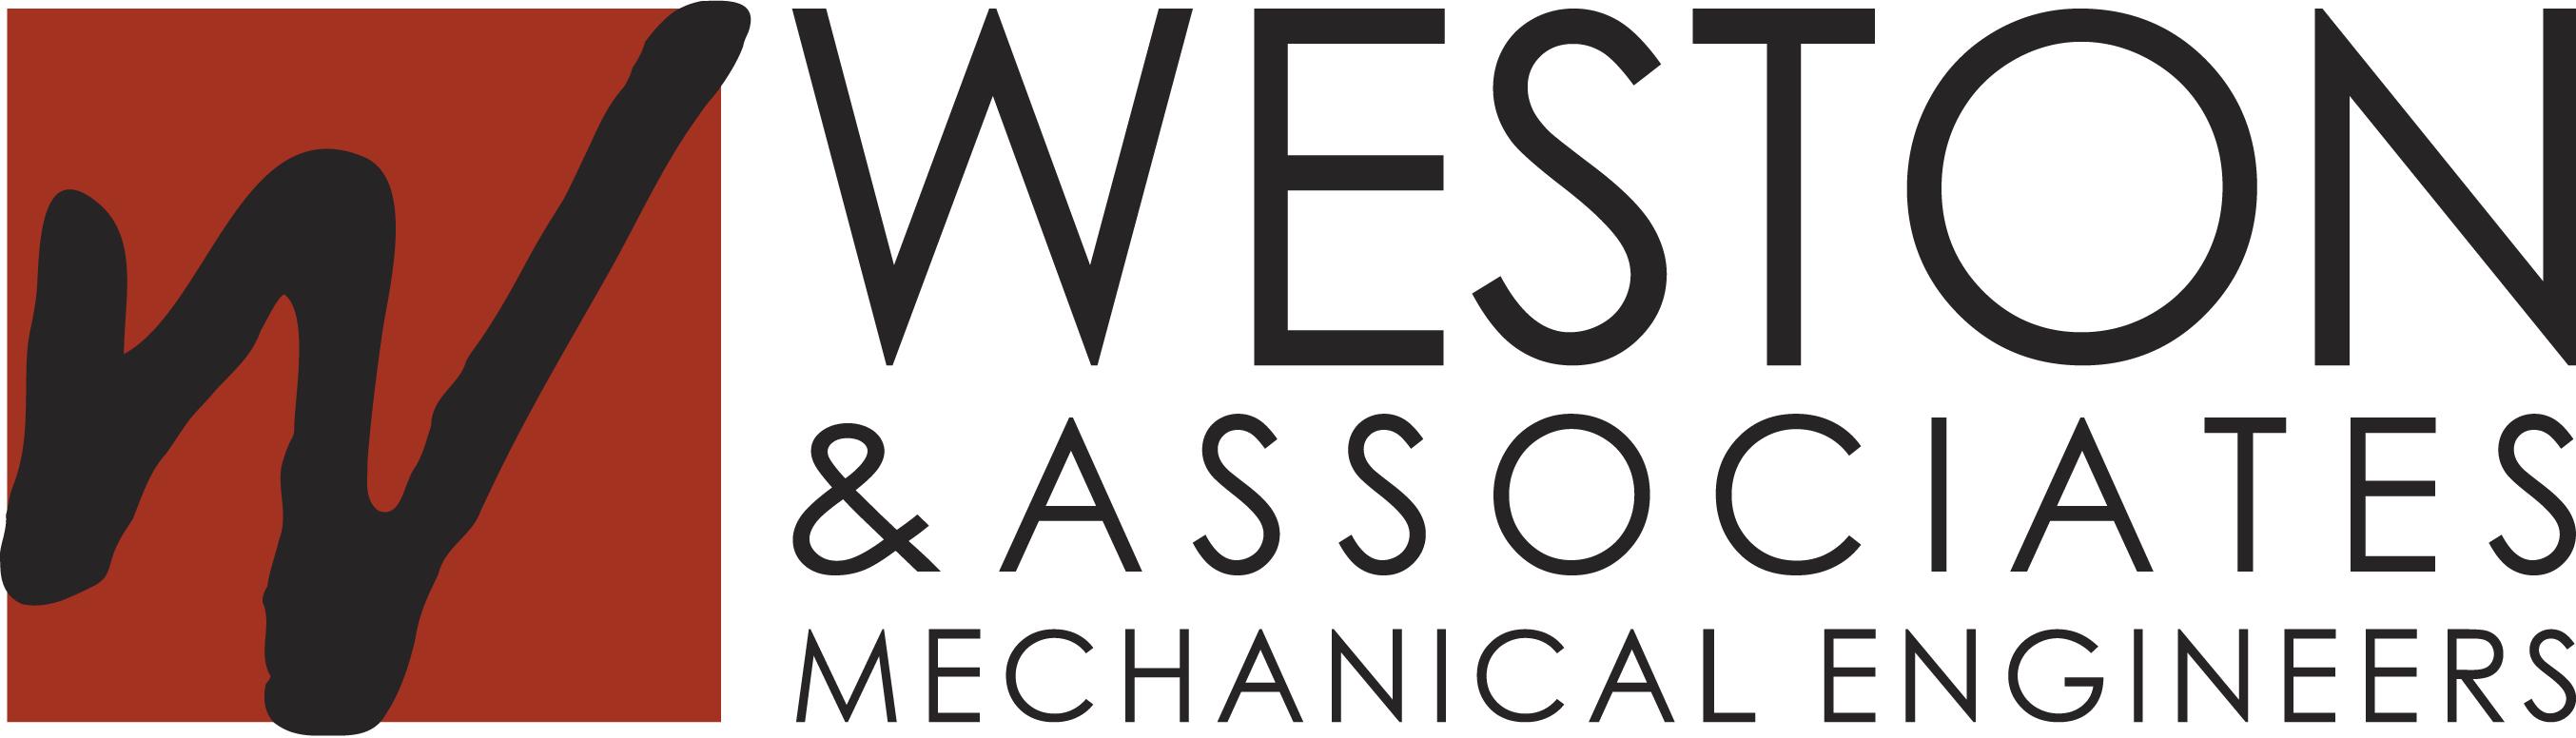 Weston & Associates